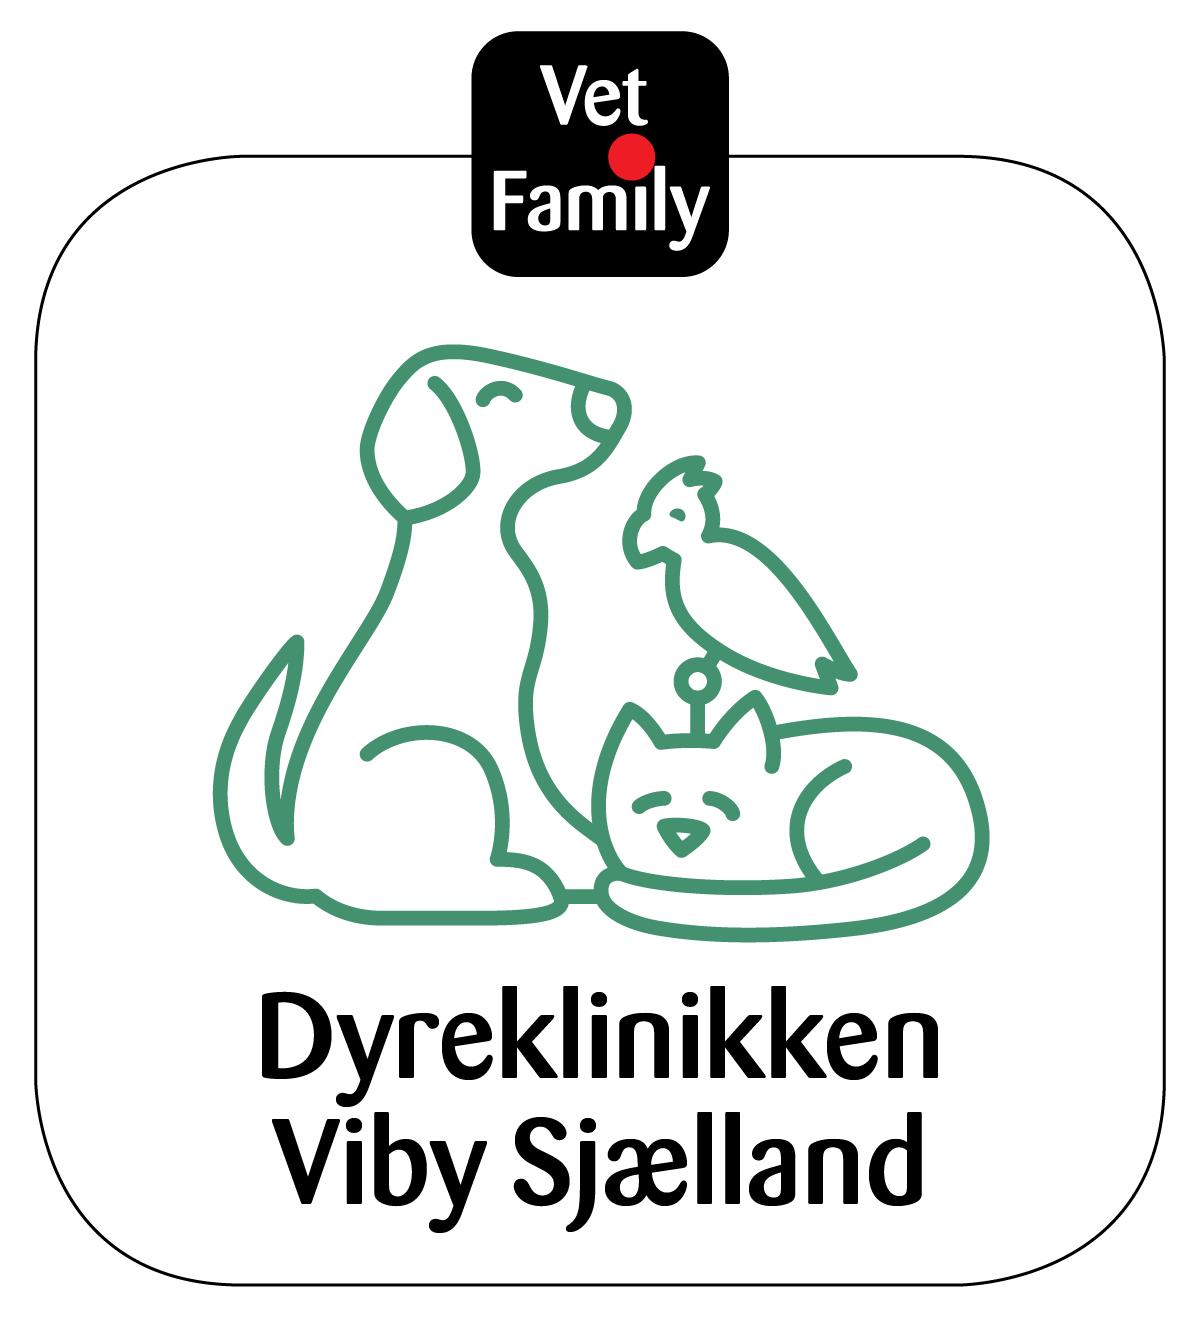 Dyreklinikken Viby Sjælland